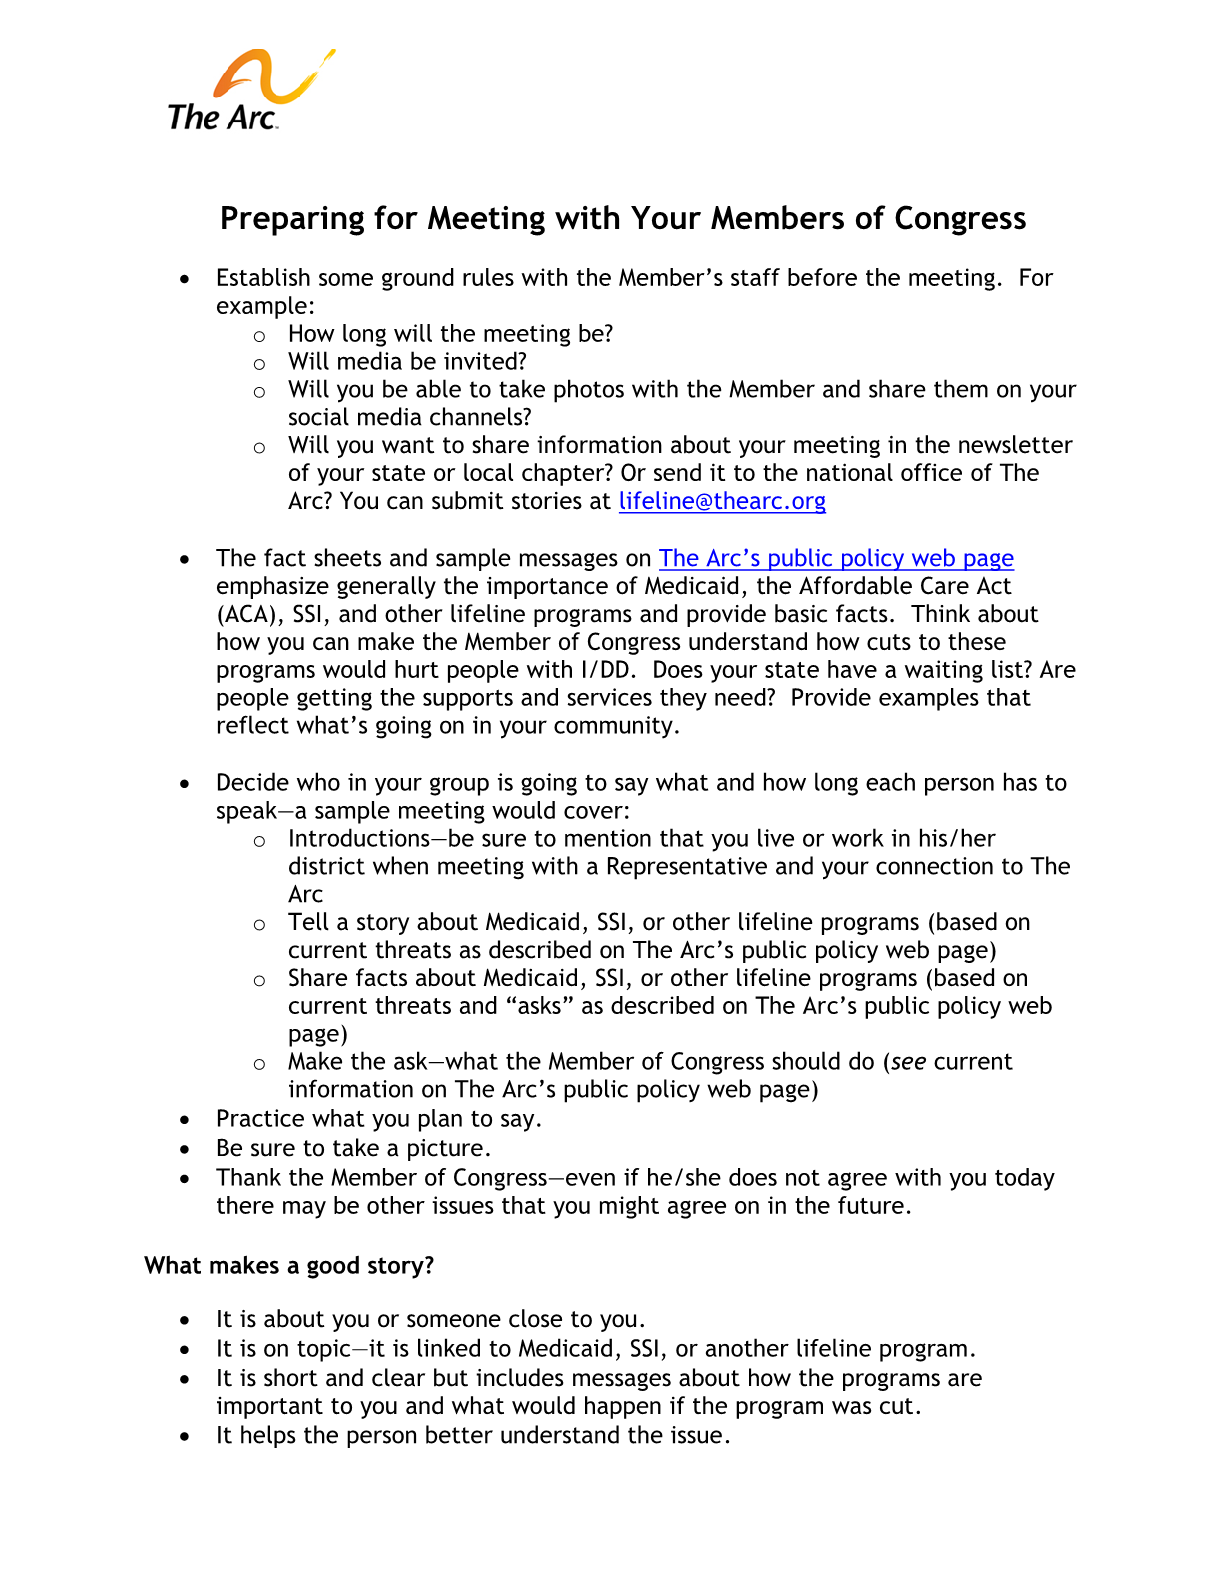 Preparing for Meetings with Members of Congress